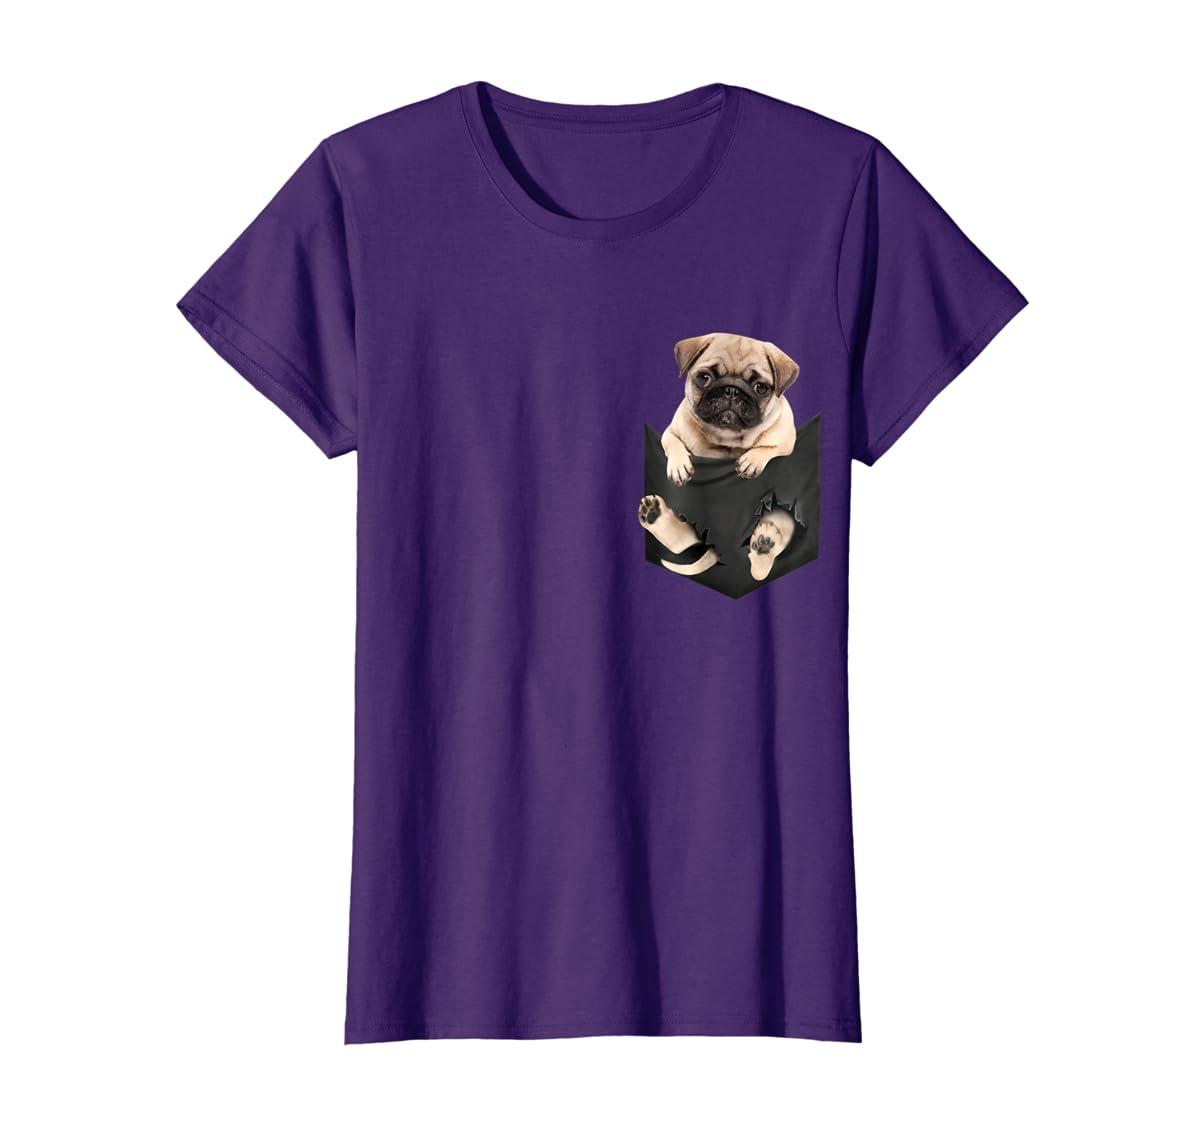 Dog in Your Pocket santa hat pug lover gift shirt-Women's T-Shirt-Purple